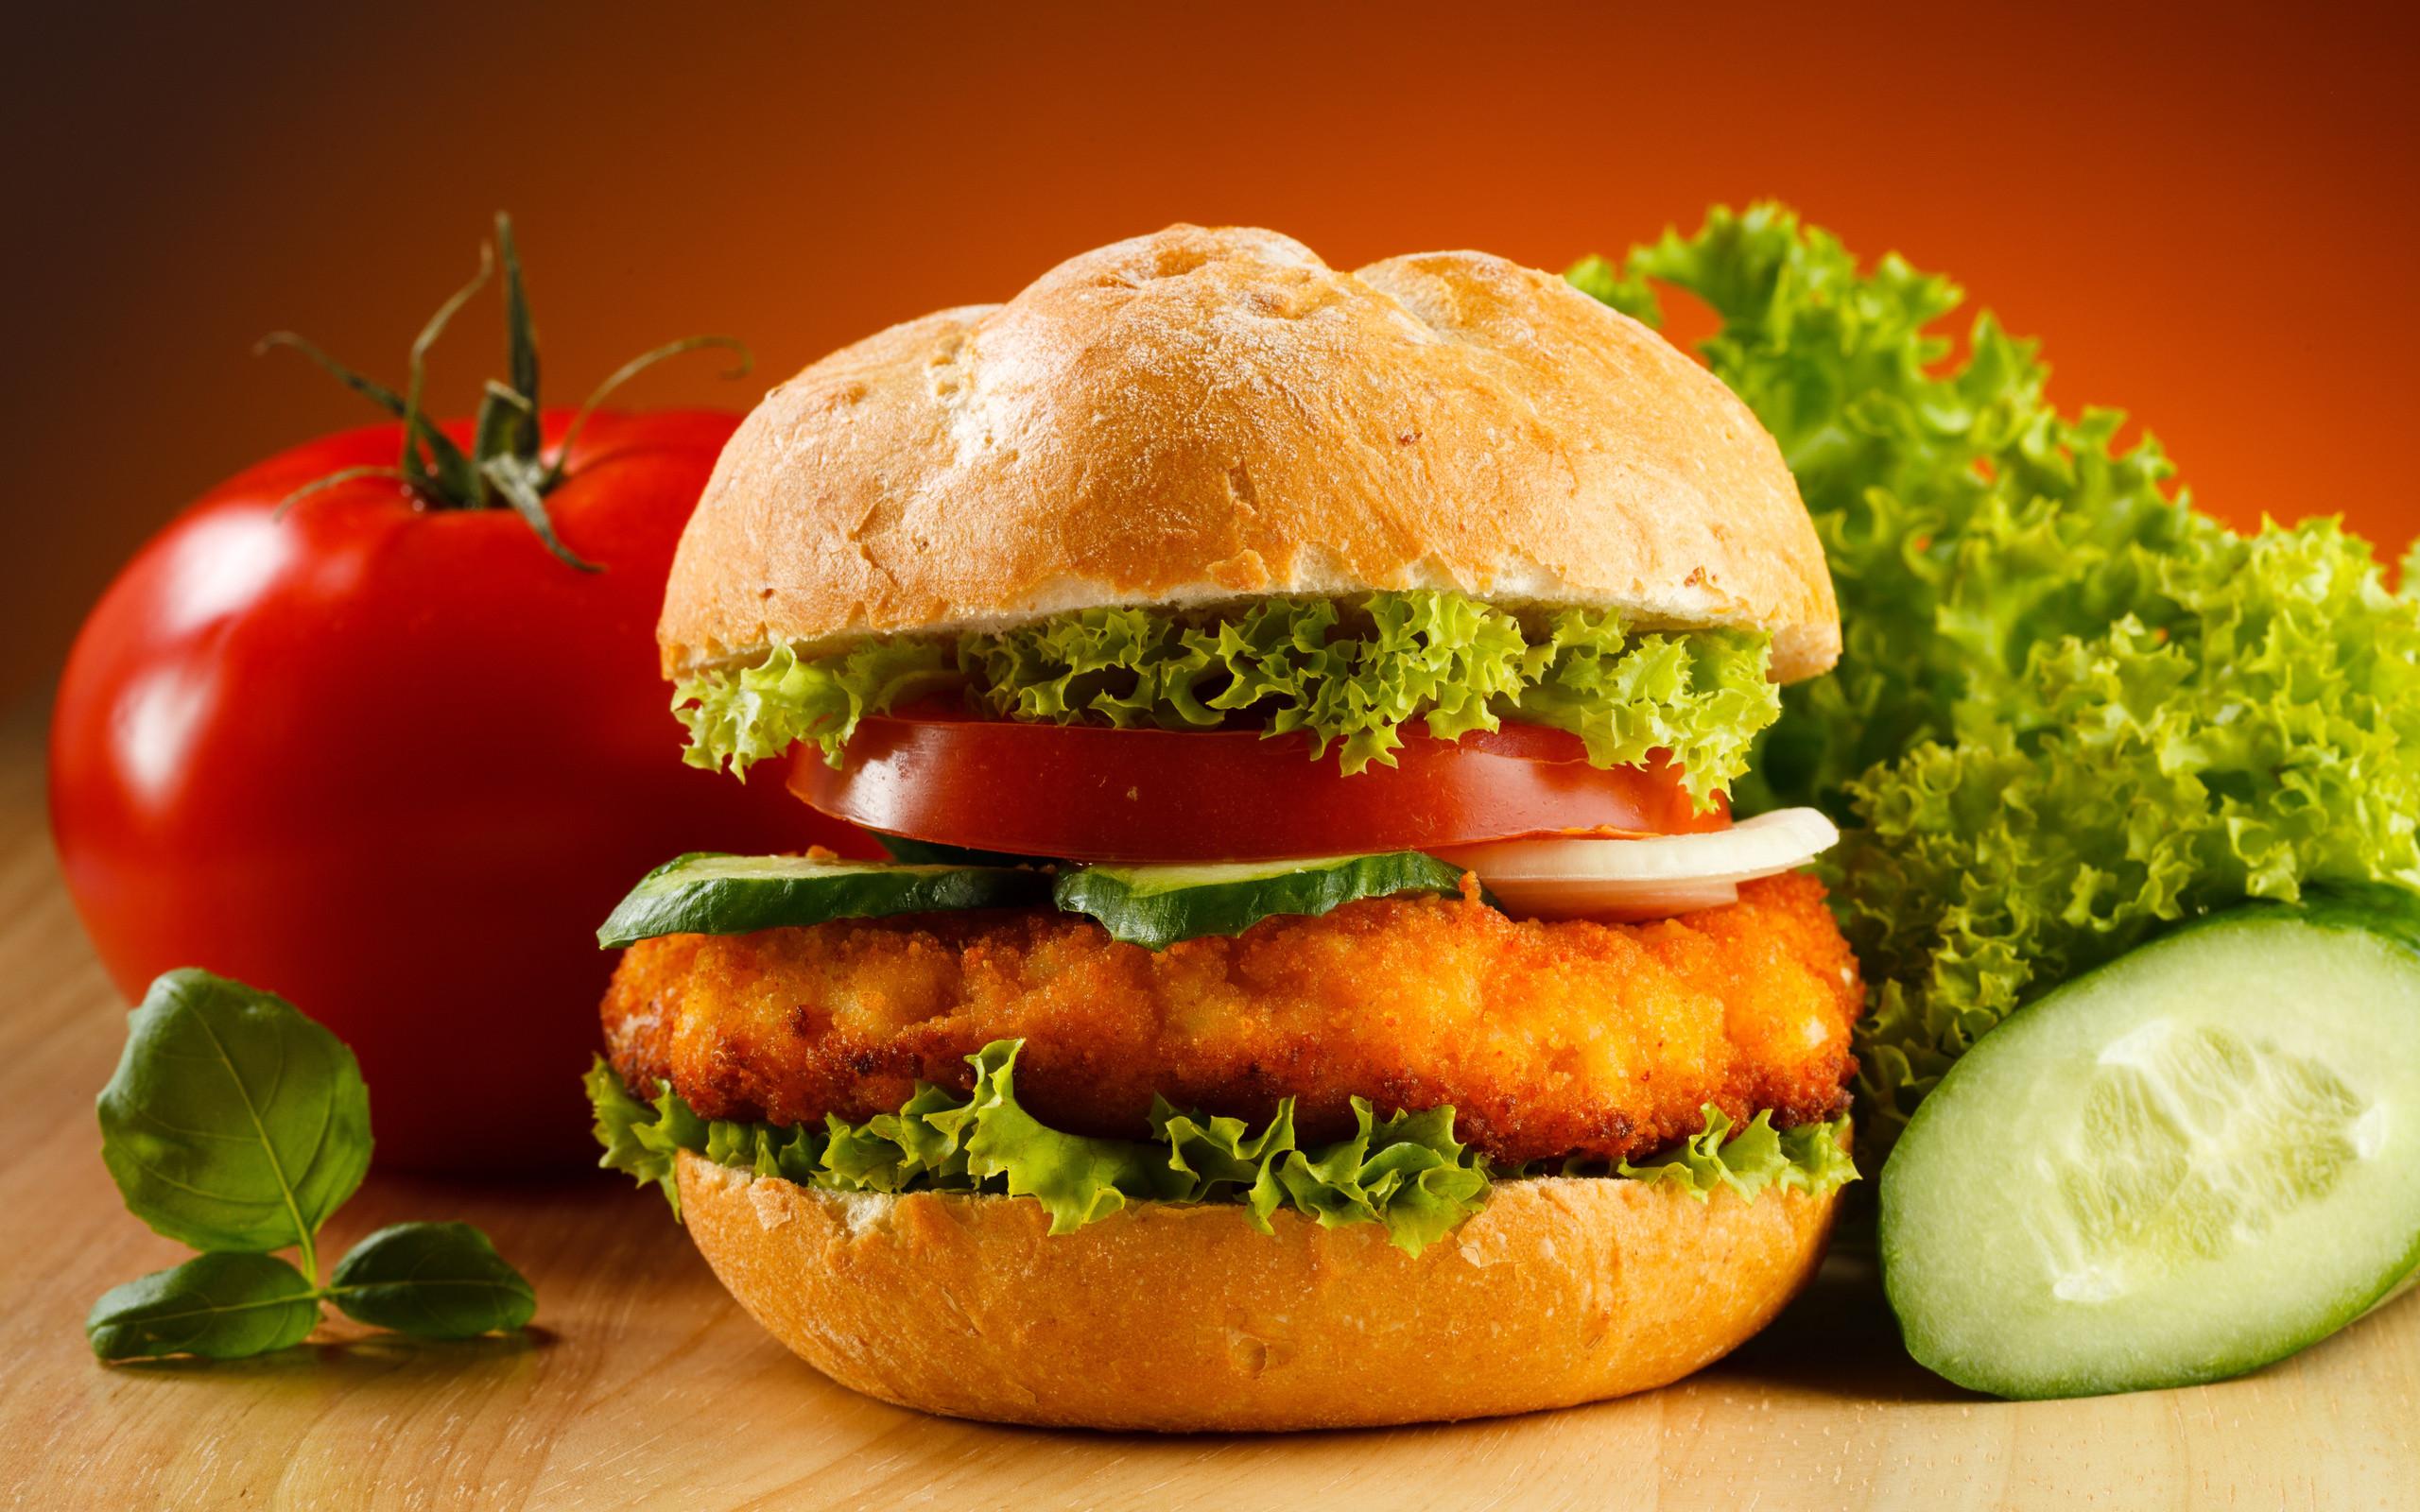 Food Wallpaper Background 4129